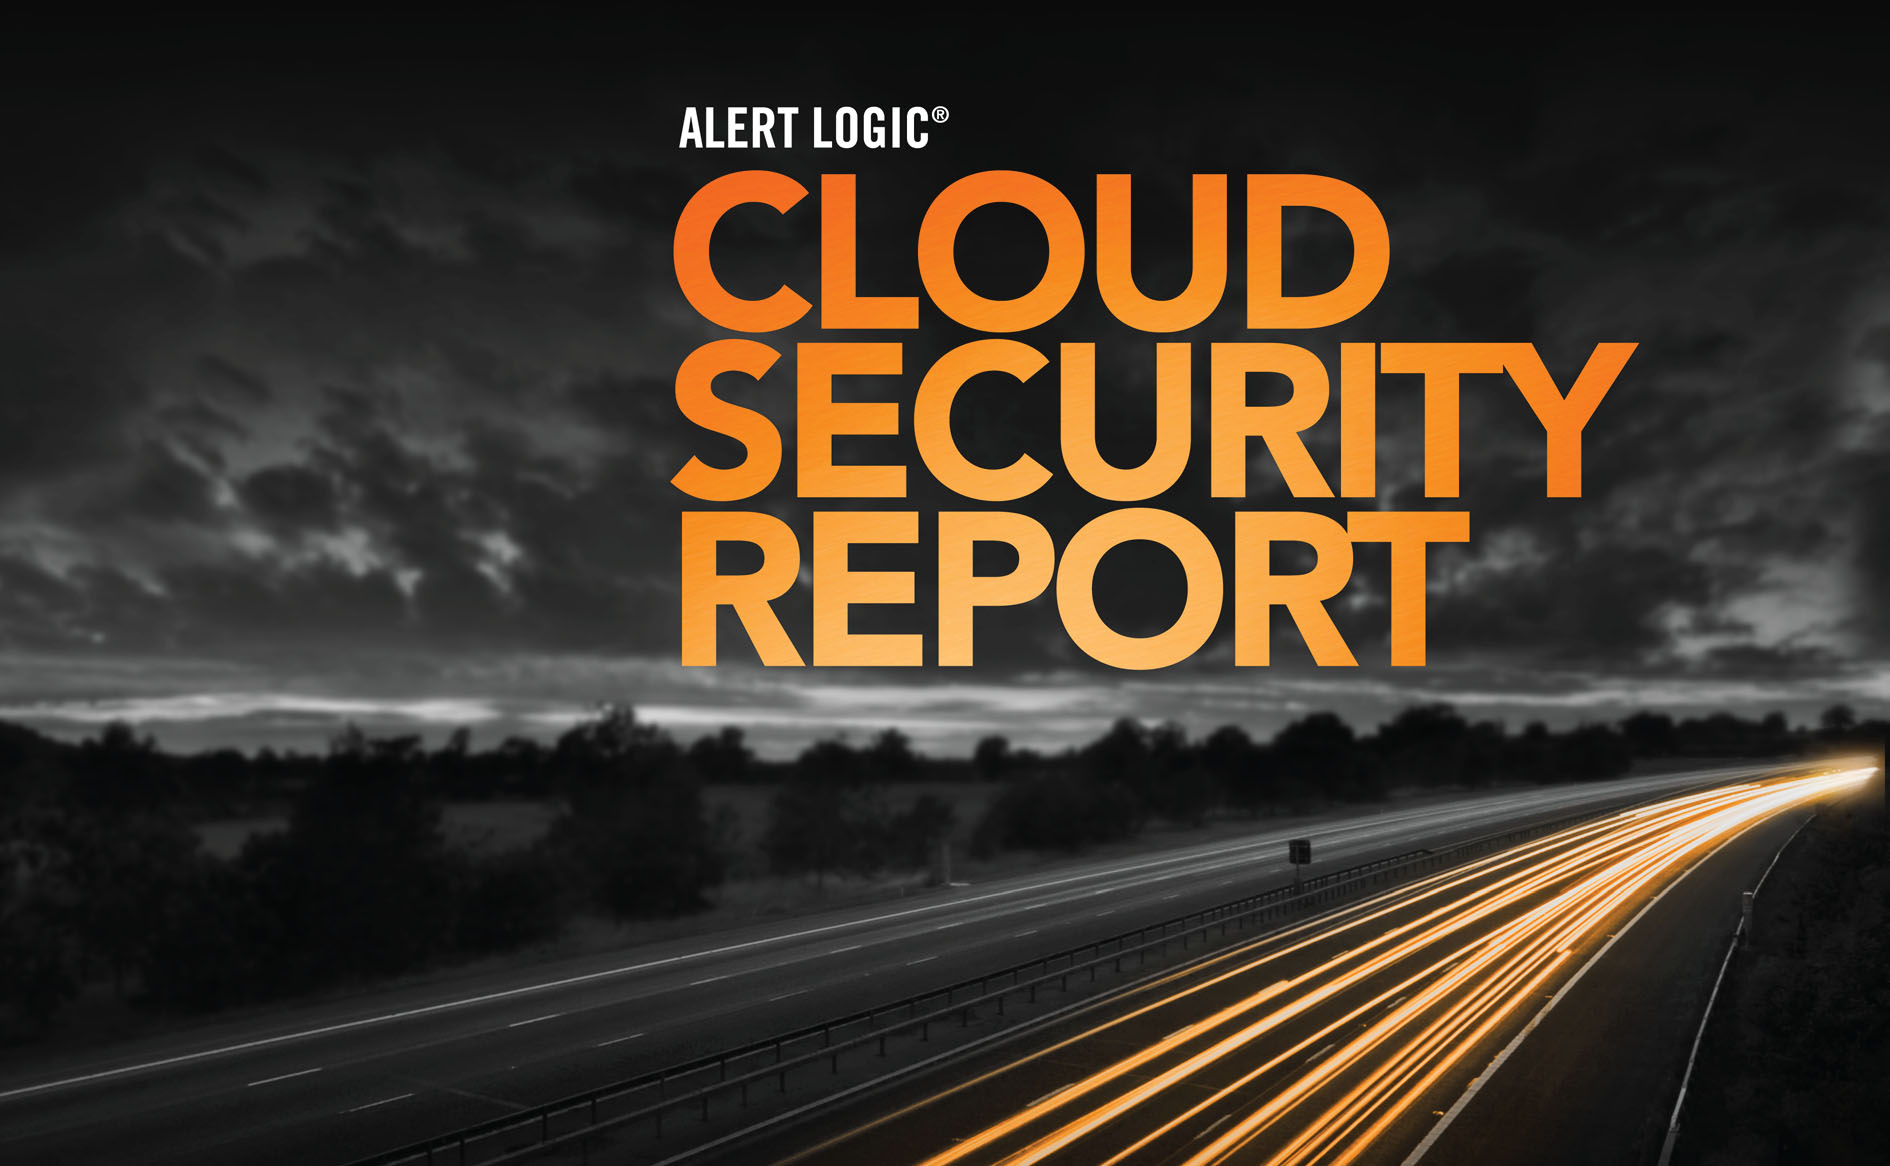 Cloud Security Report